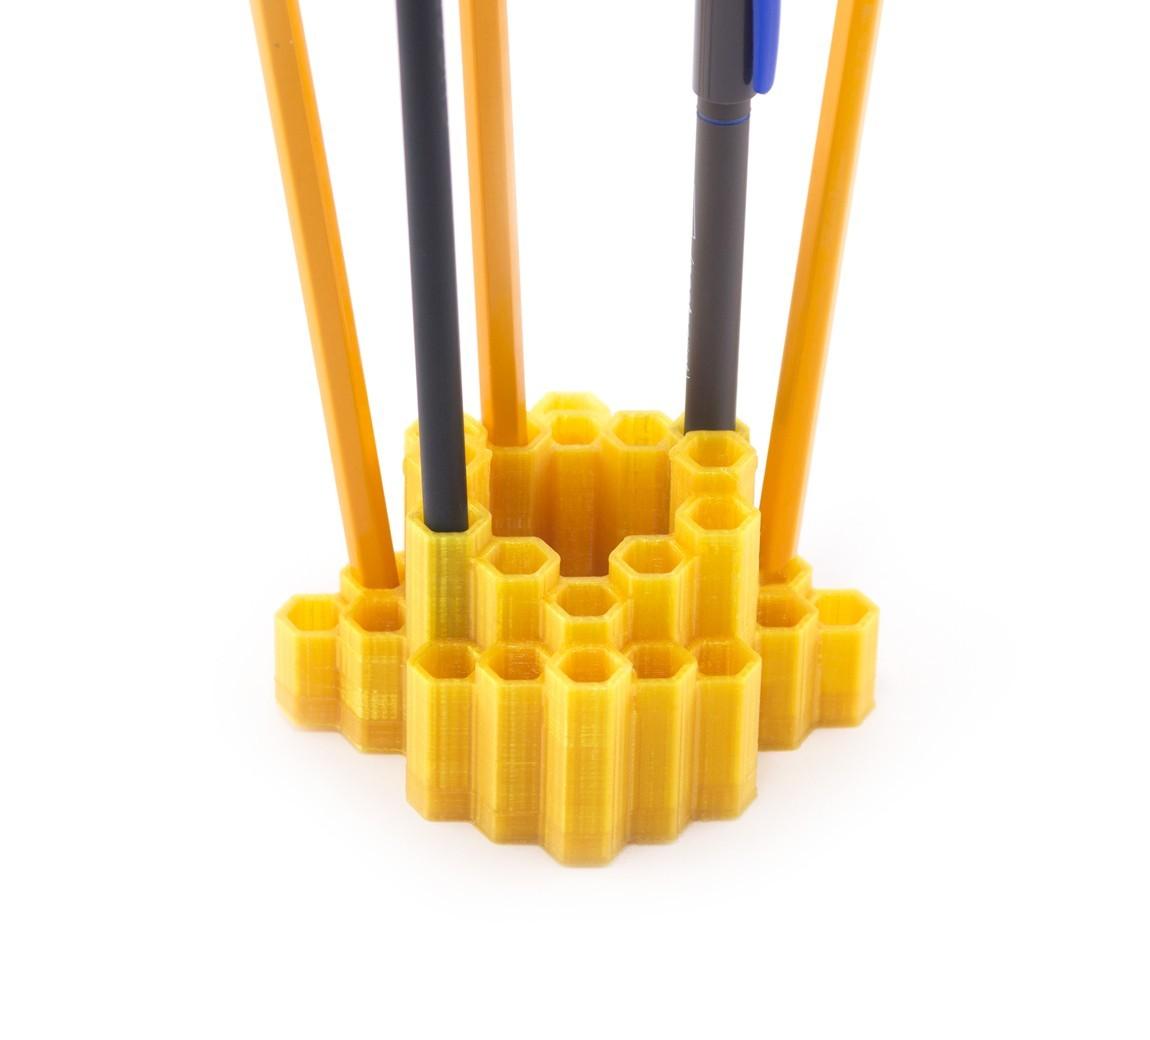 210367df949ca690fe7a9479b1862815_1452537385493_01.07.15-product-shoot-064.jpg Download free STL file Honeycomb Cup • 3D print model, Terryyy